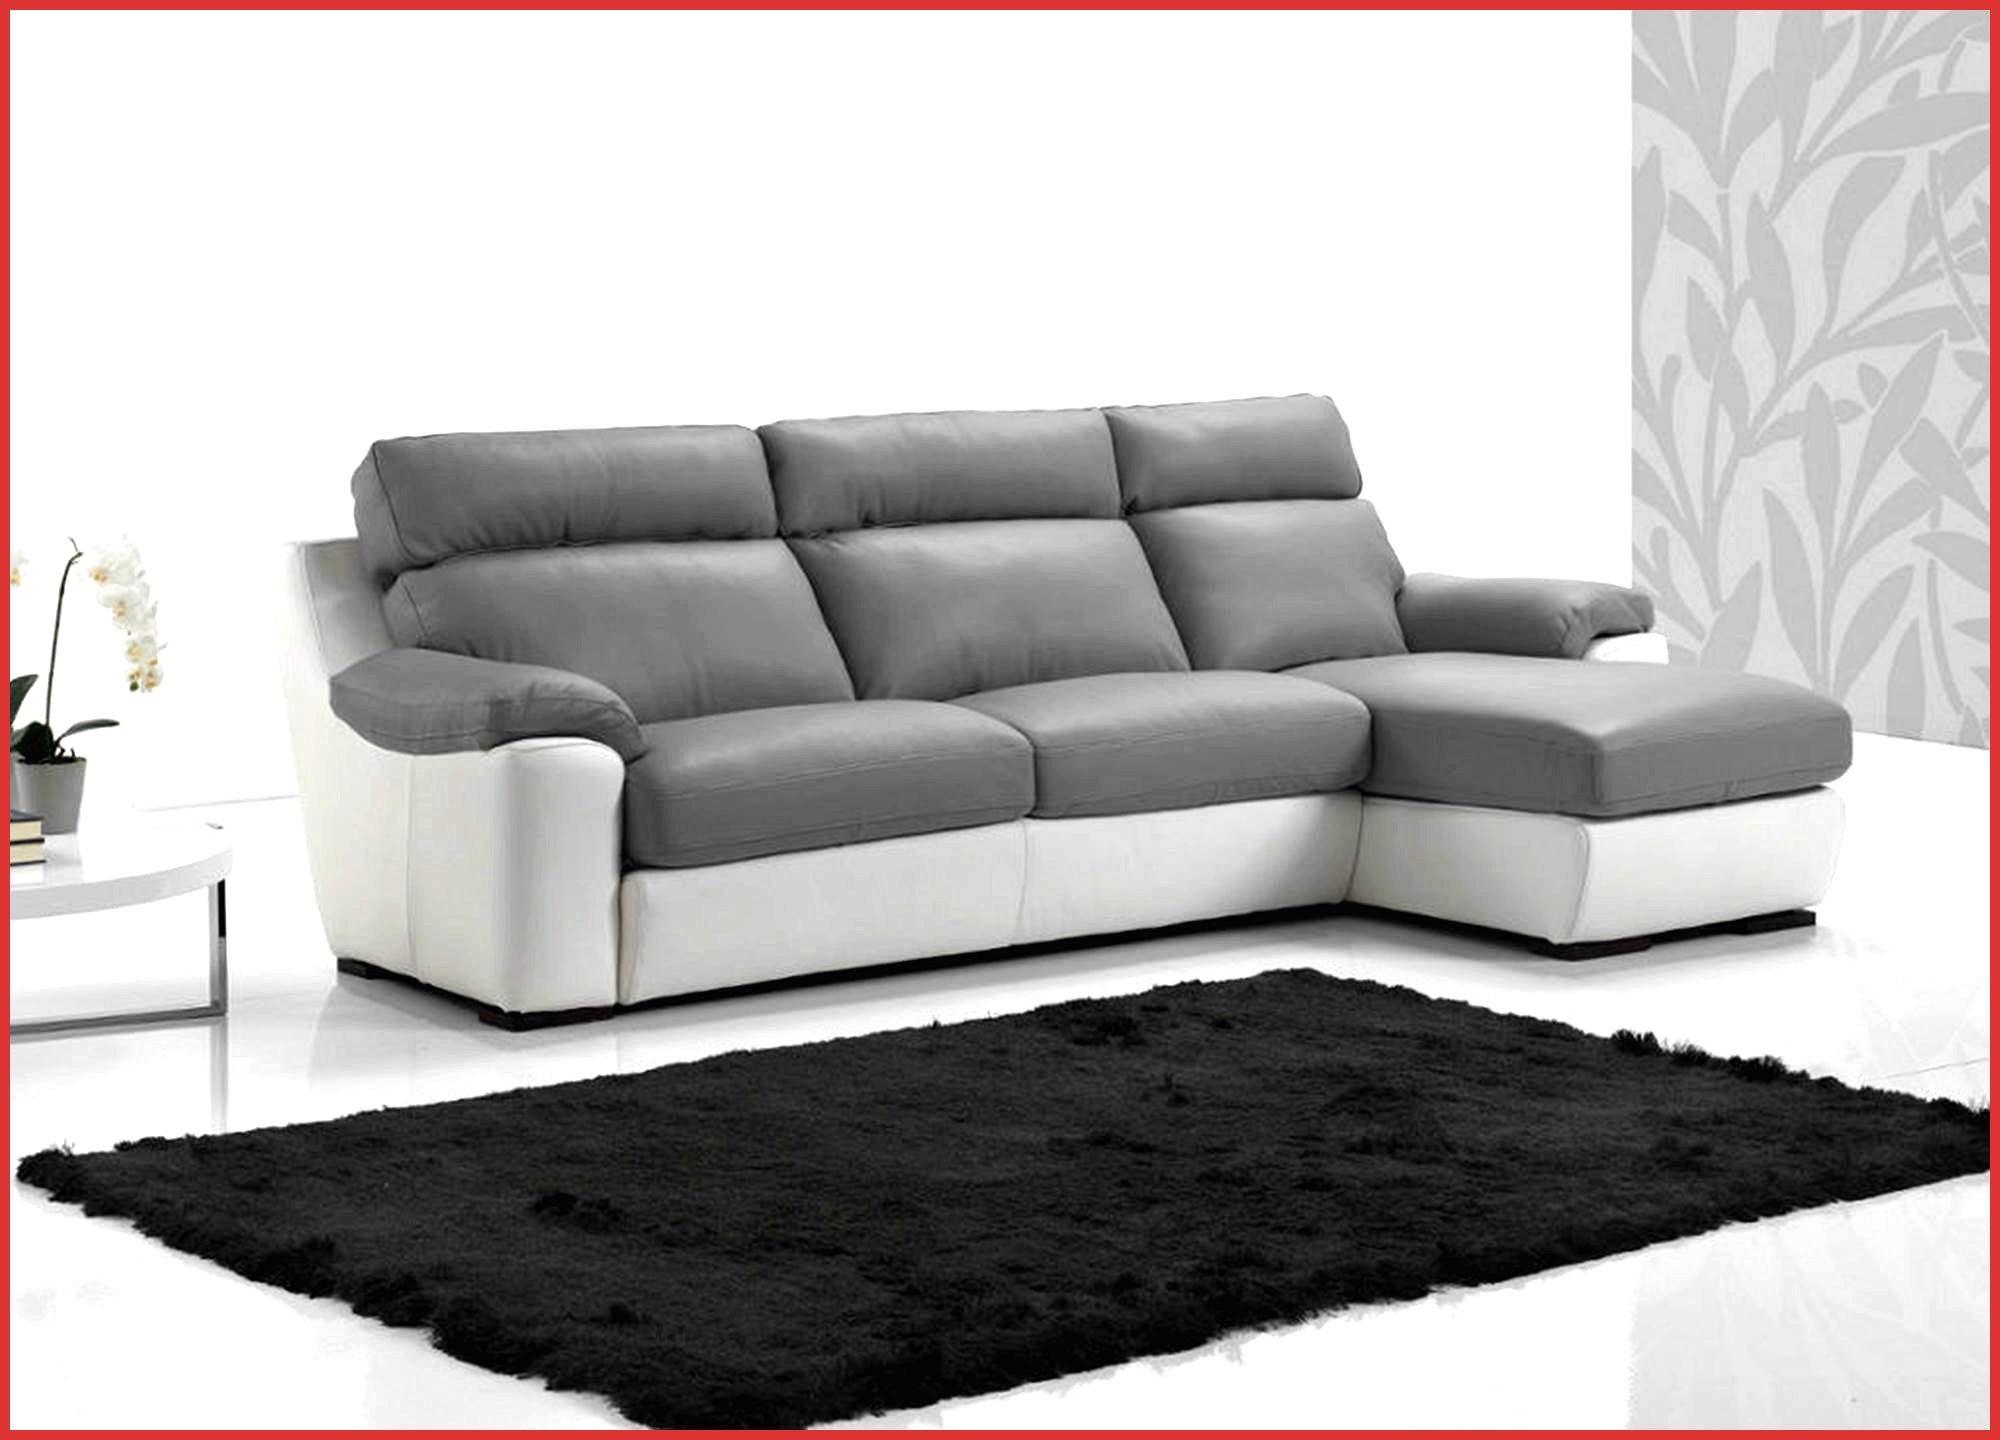 Canapé Italien Direct Usine Meilleur De Images Canap Italien sofa Stunning Canap Design Italien with Canap Italien